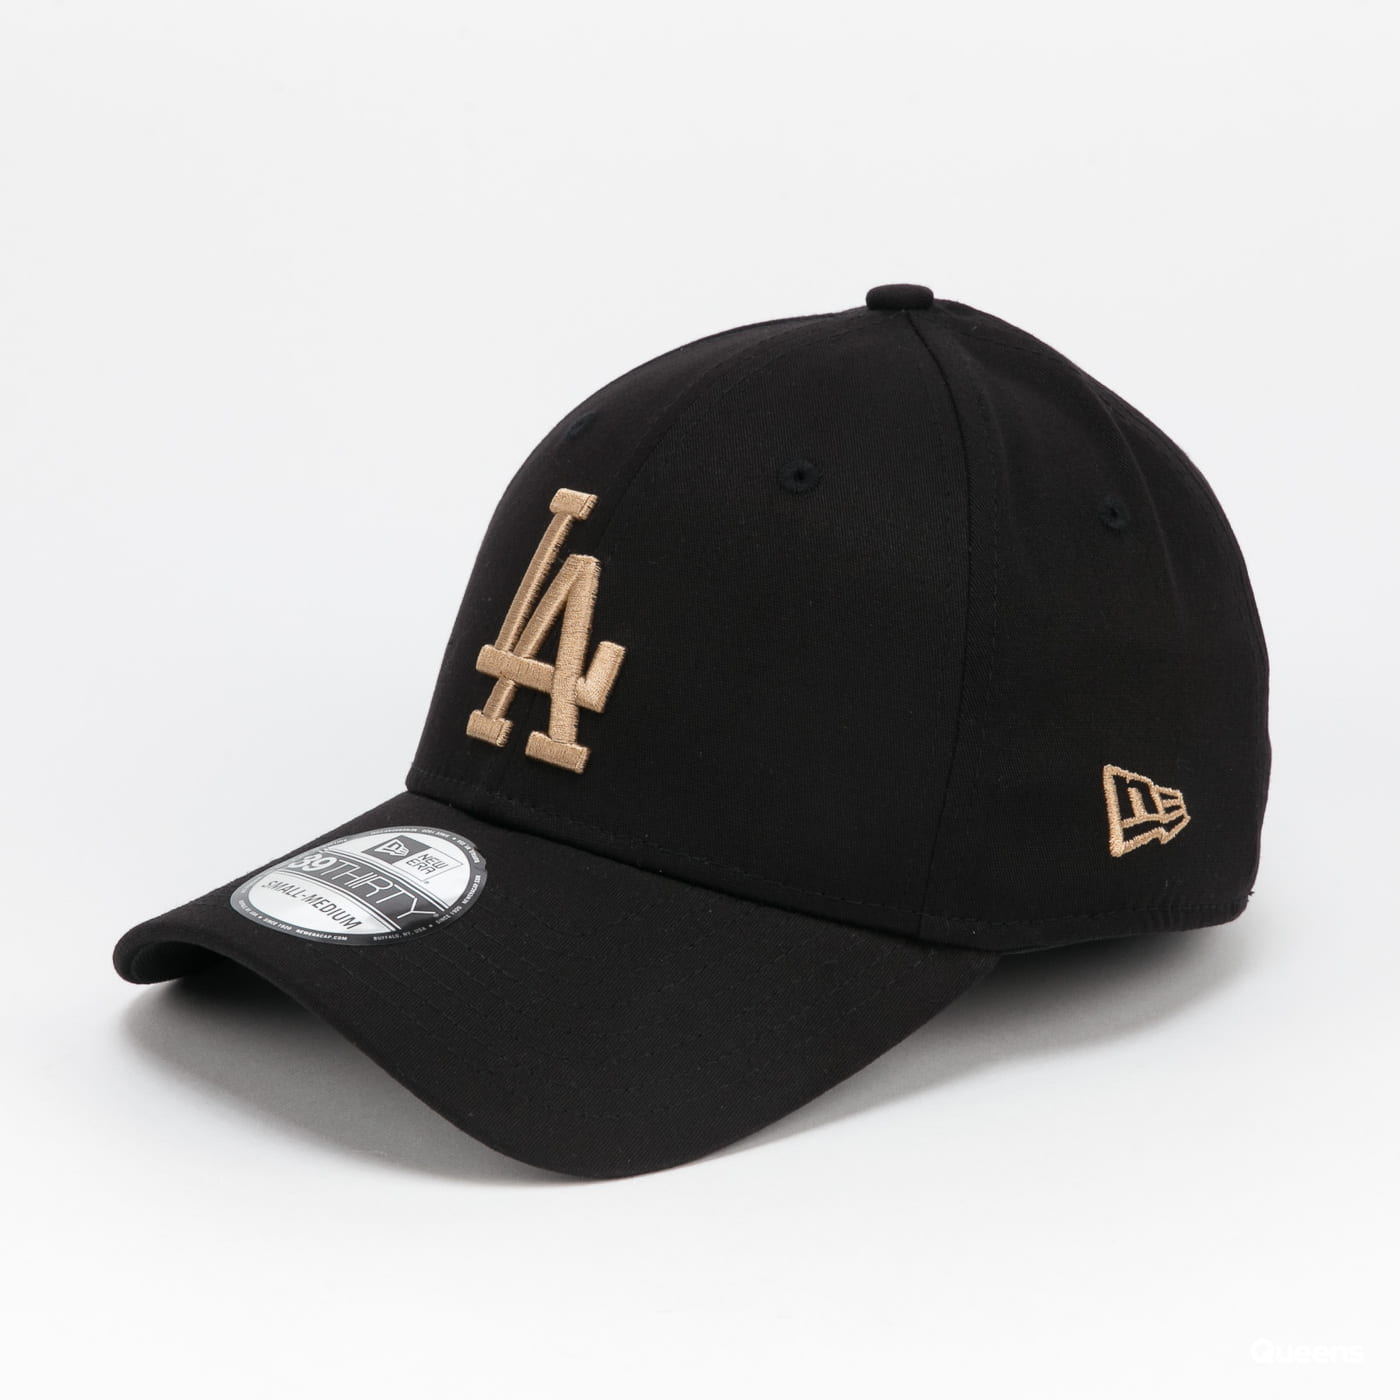 New Era 3930 MLB League Essential LA black / beige